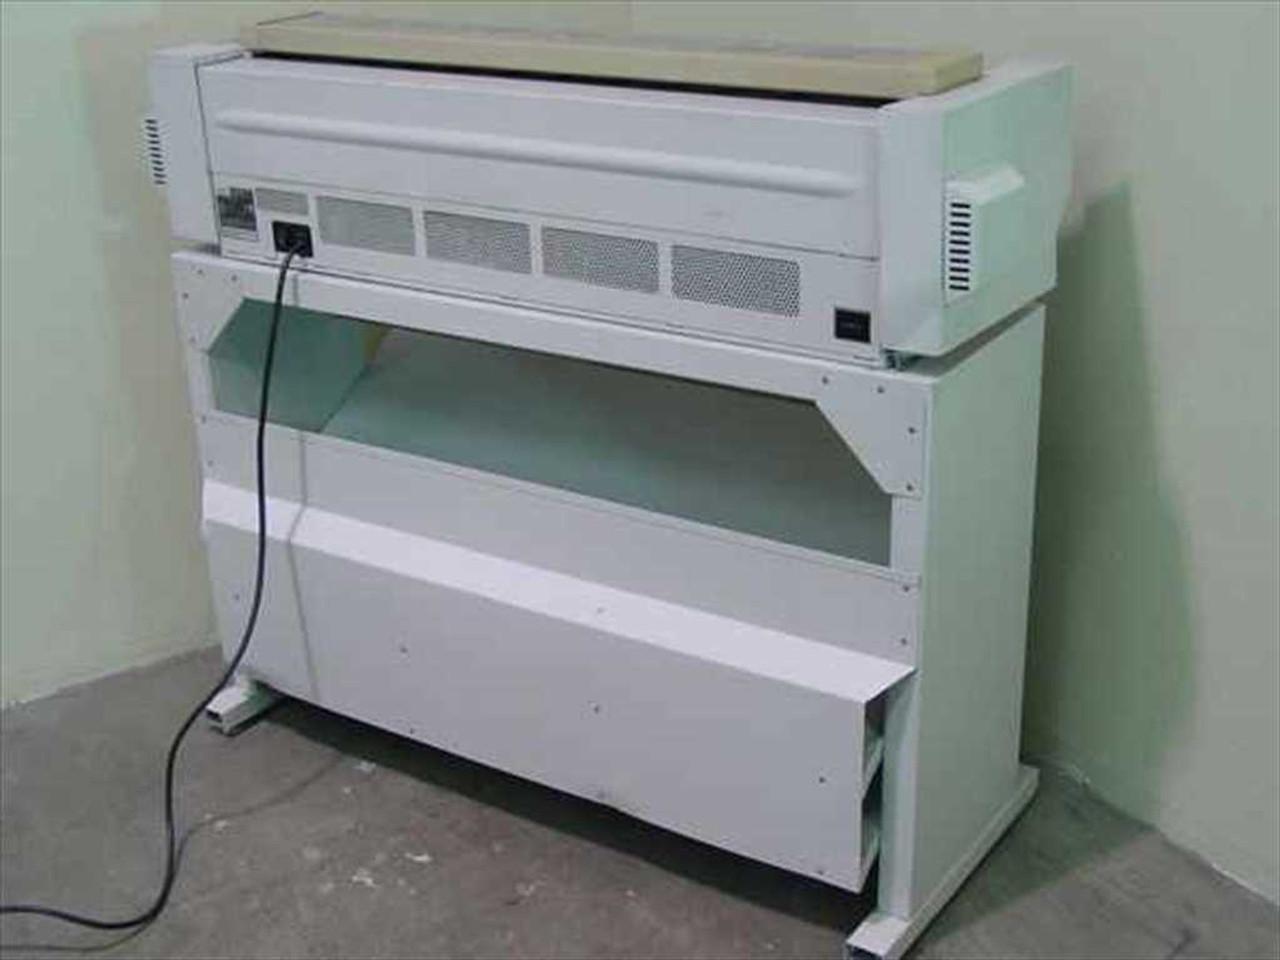 ... Xerox 2510 Xerox 2510 Engineering Copier w/Manual- Parts ...